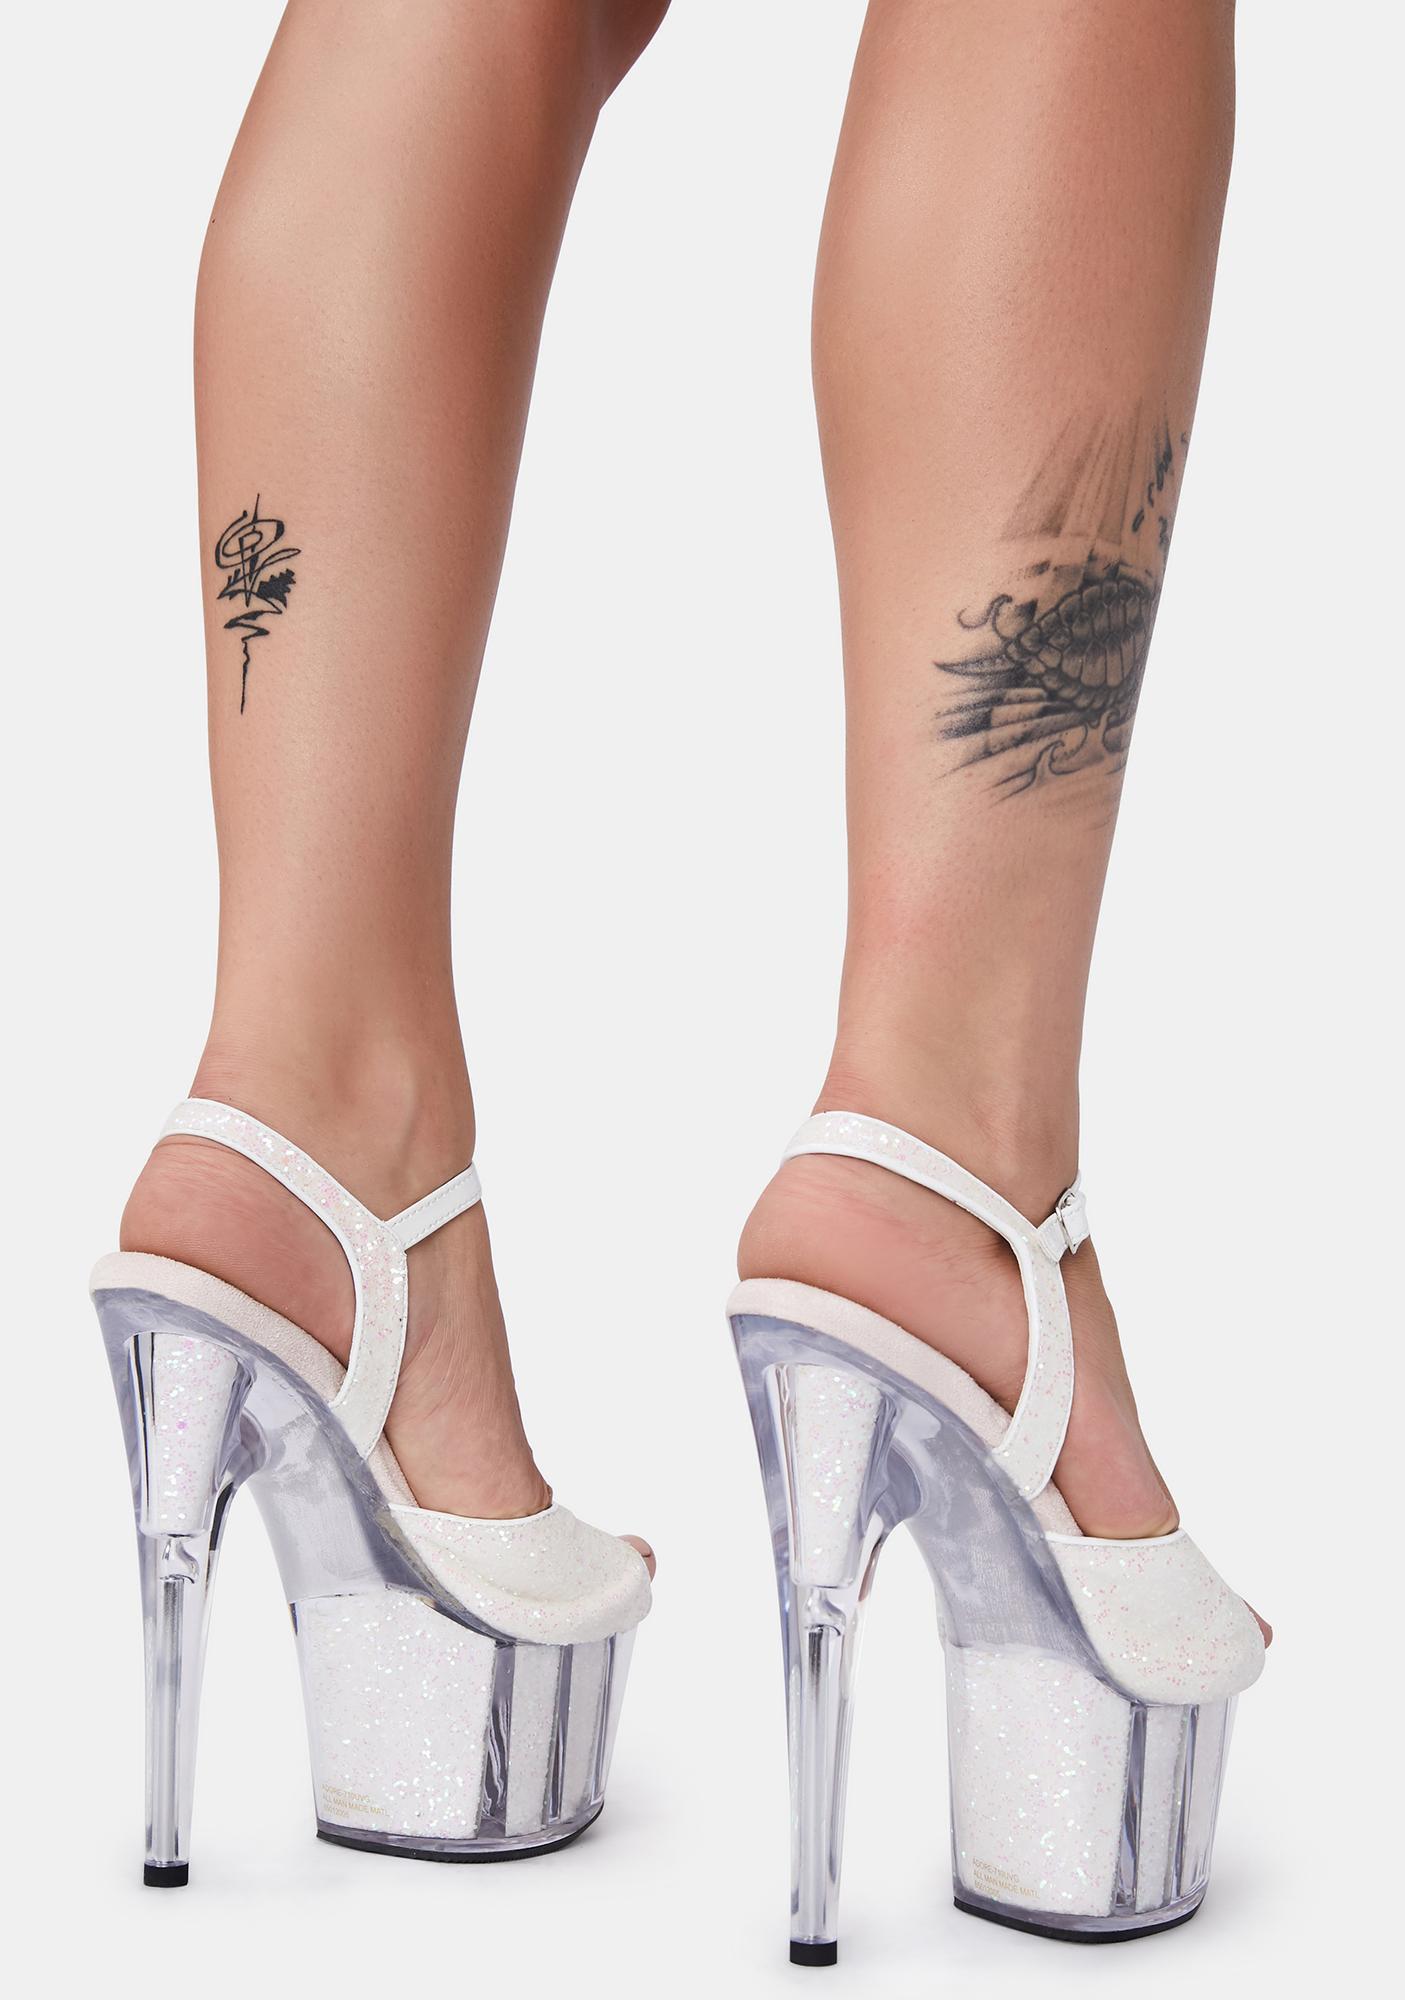 Pleaser Flashy Fantasy UV Reactive Platform Heels